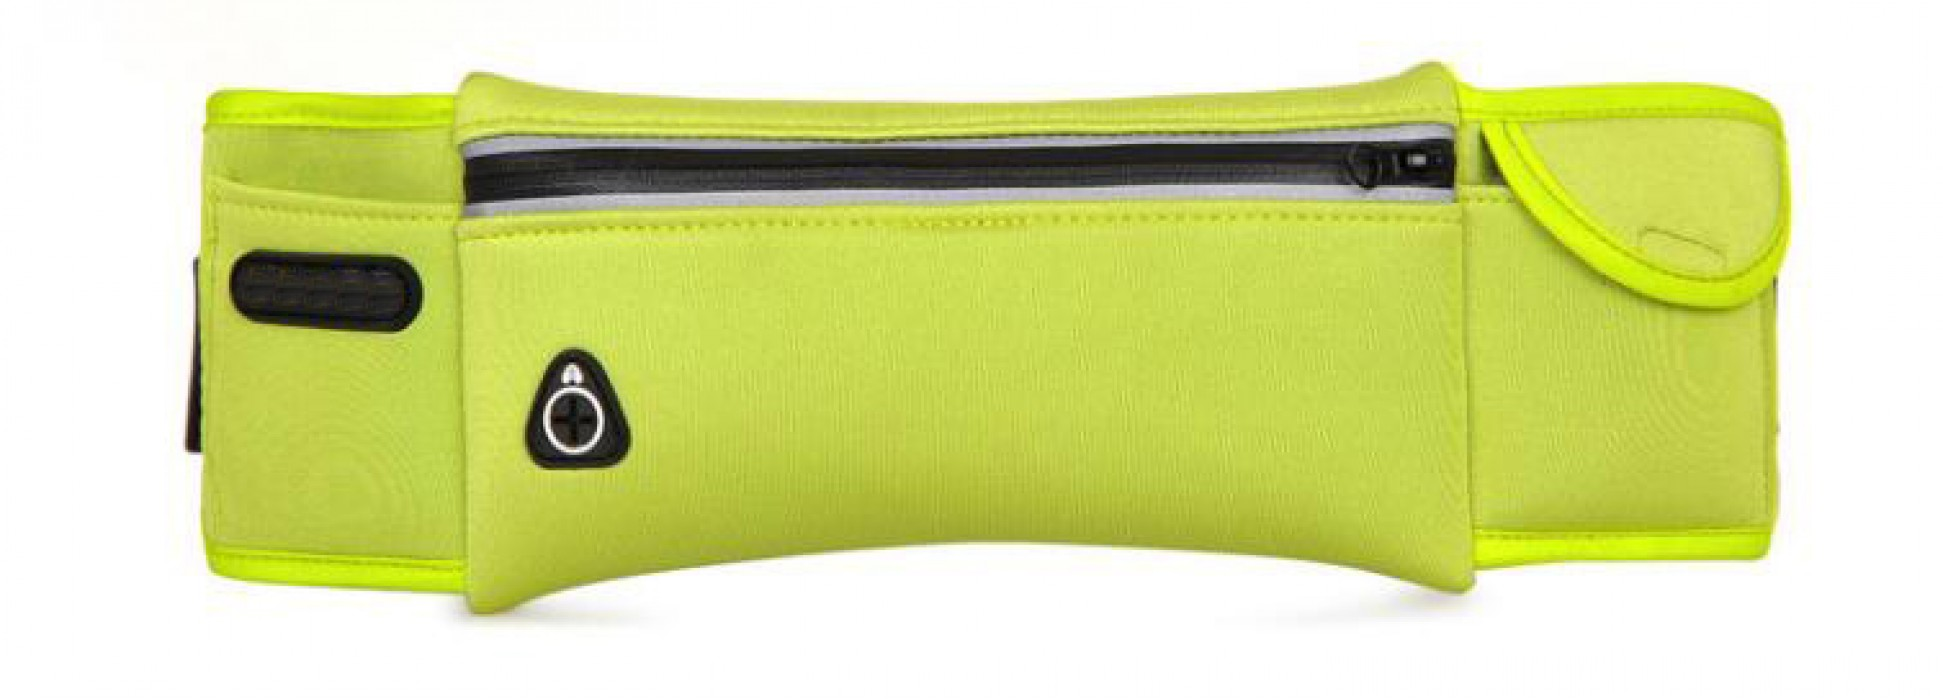 PK004  訂造輕便腰包款式   設計運動腰包款式 行山   跑步  長跑  製作防水腰包款式  腰包專門店